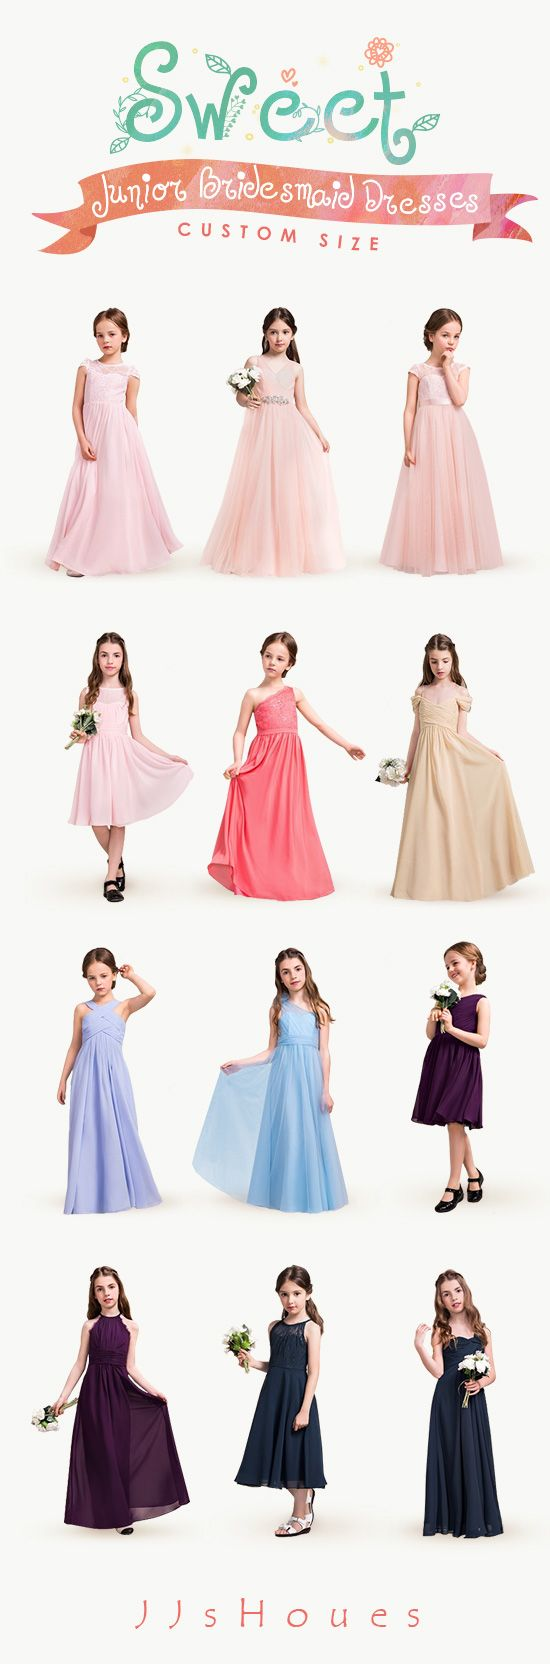 Best 25 jr bridesmaid dresses ideas on pinterest junior sweet junior bridesmaid dresses custom size bridesmaiddresses ombrellifo Gallery